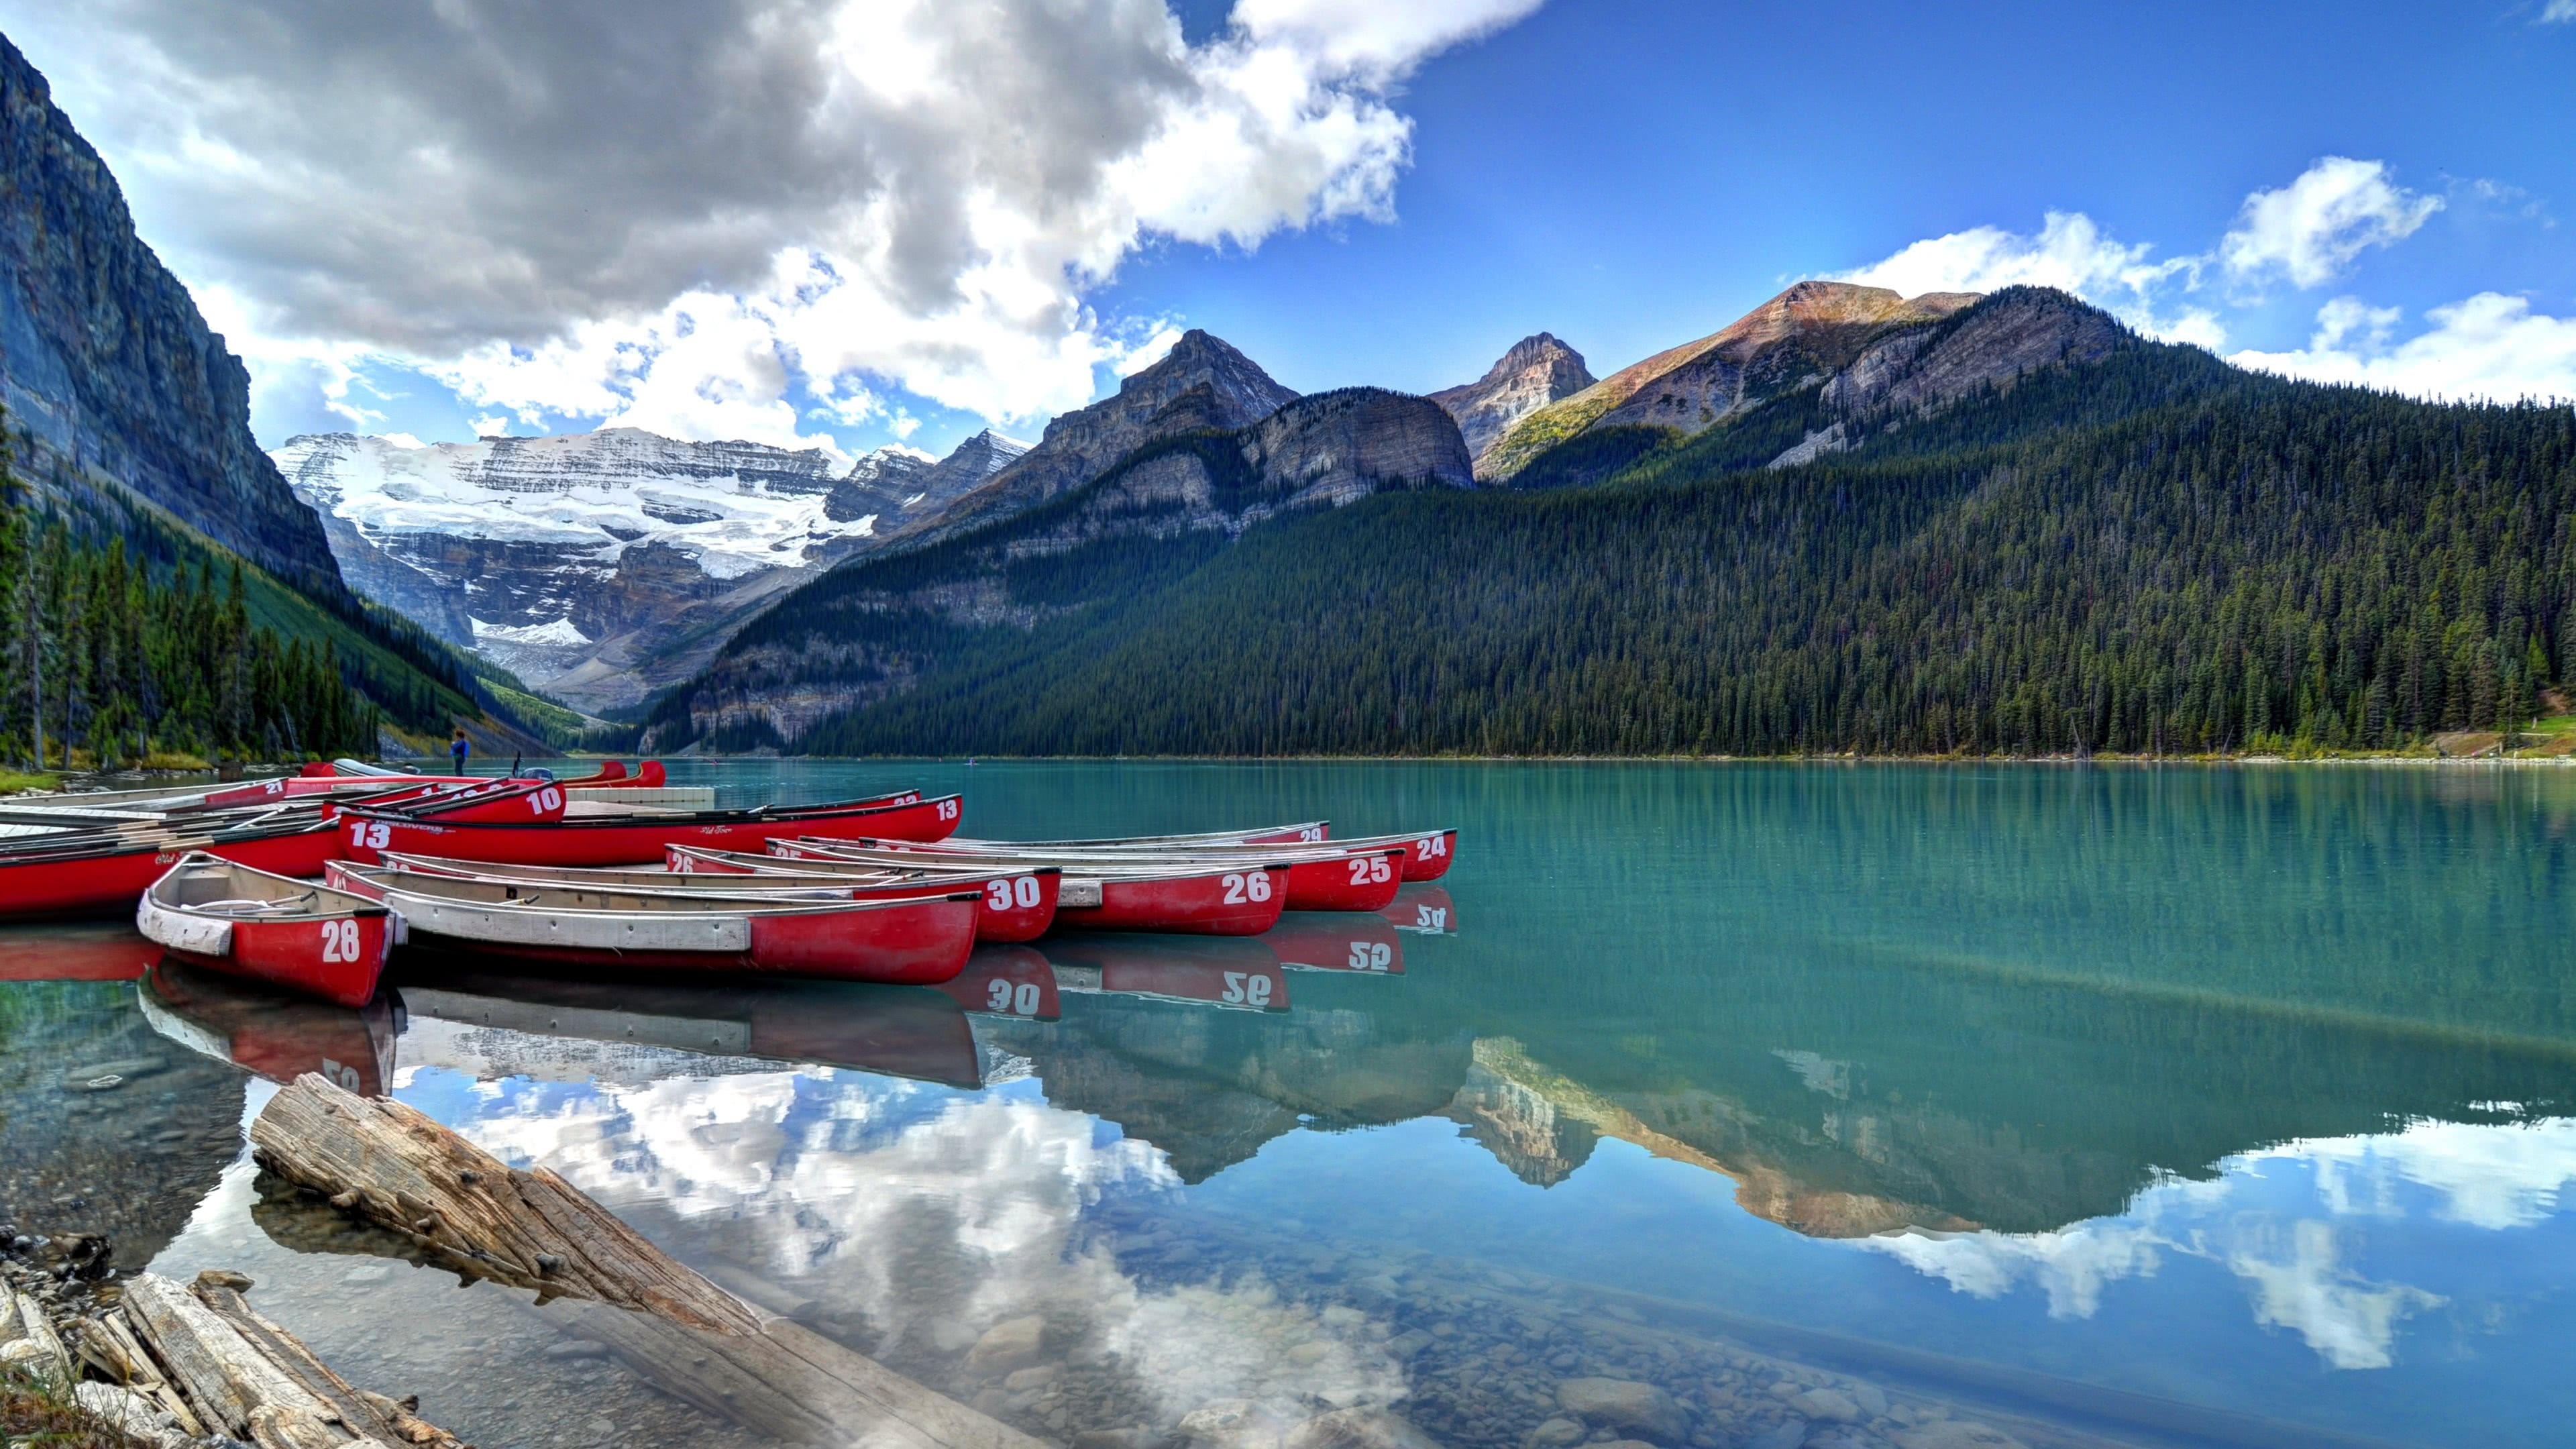 canoes lake louise banff canada uhd 4k wallpaper